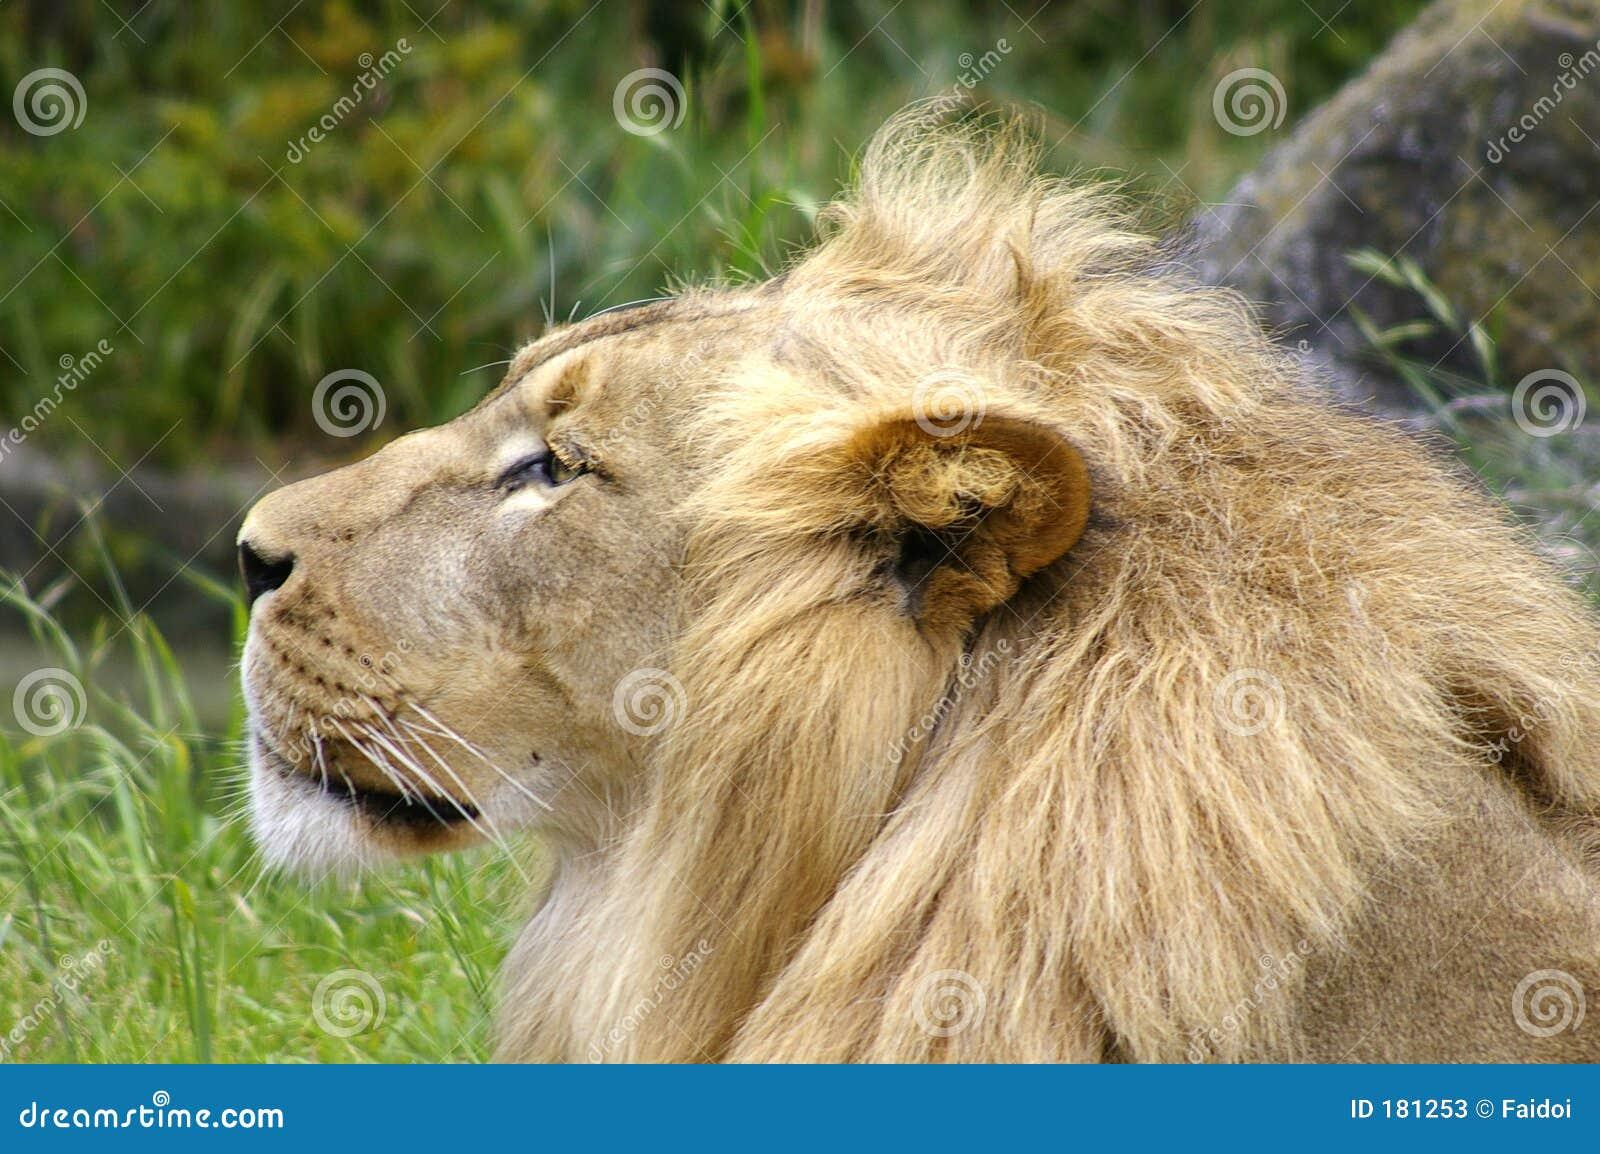 Lion Side View Face